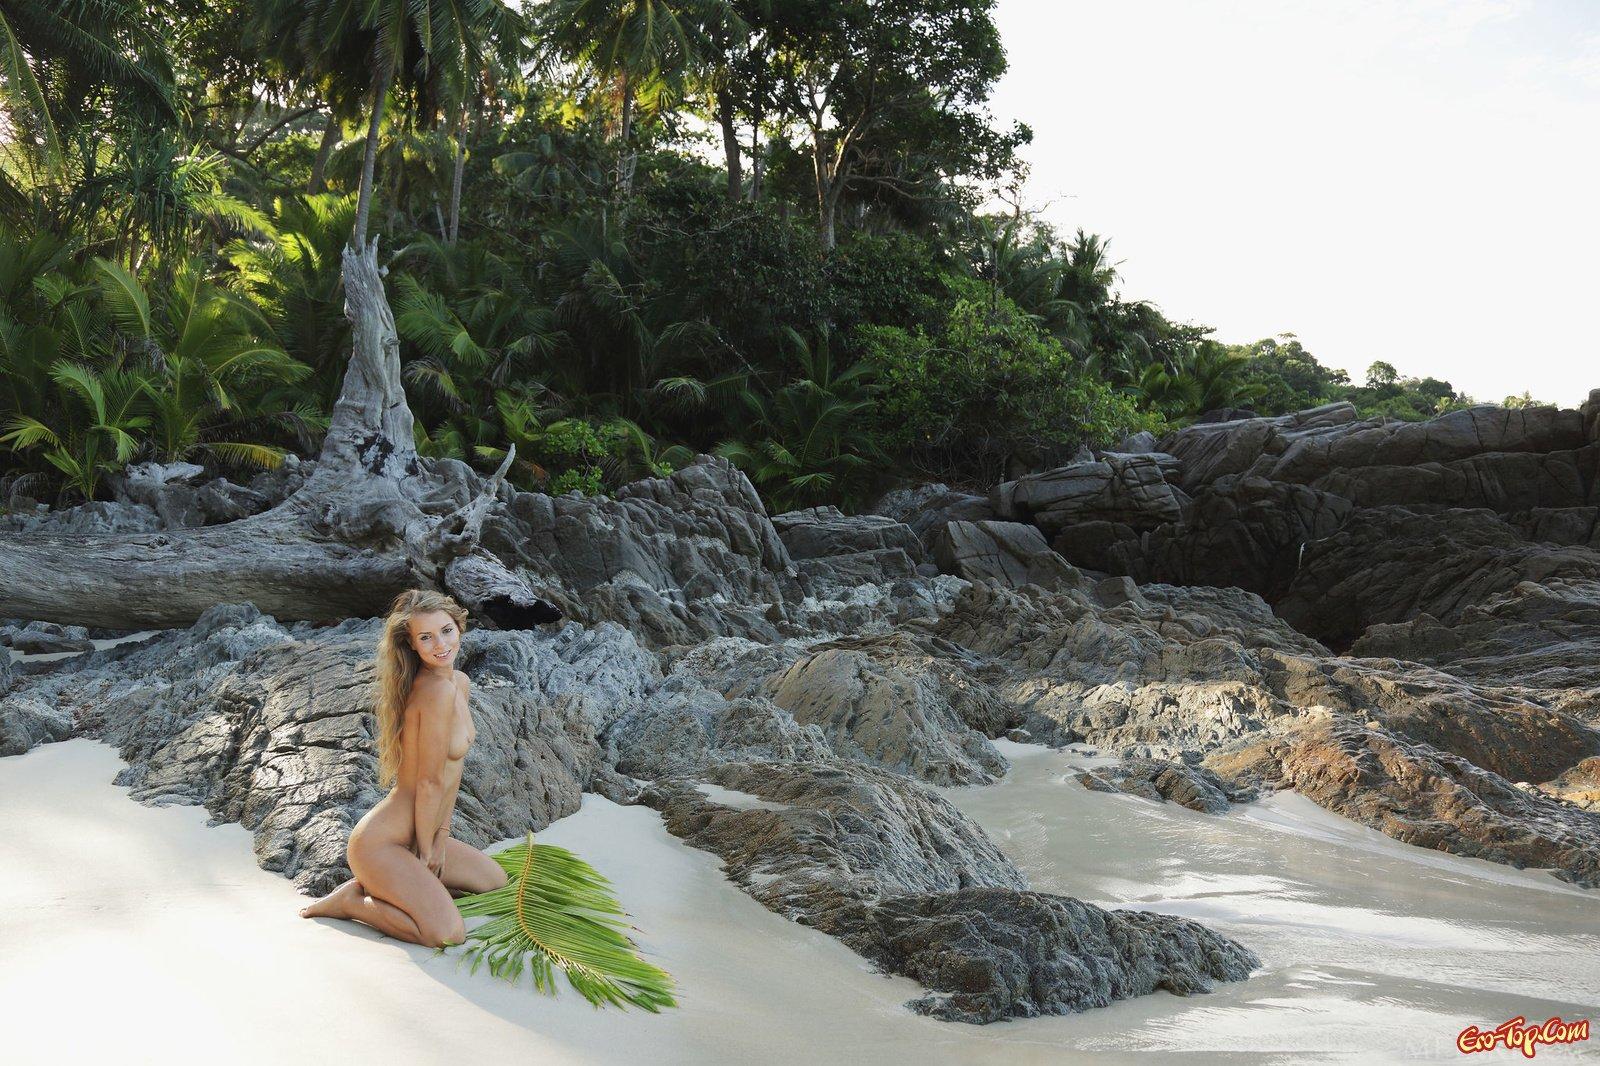 20-летняя тёлка на берегу моря